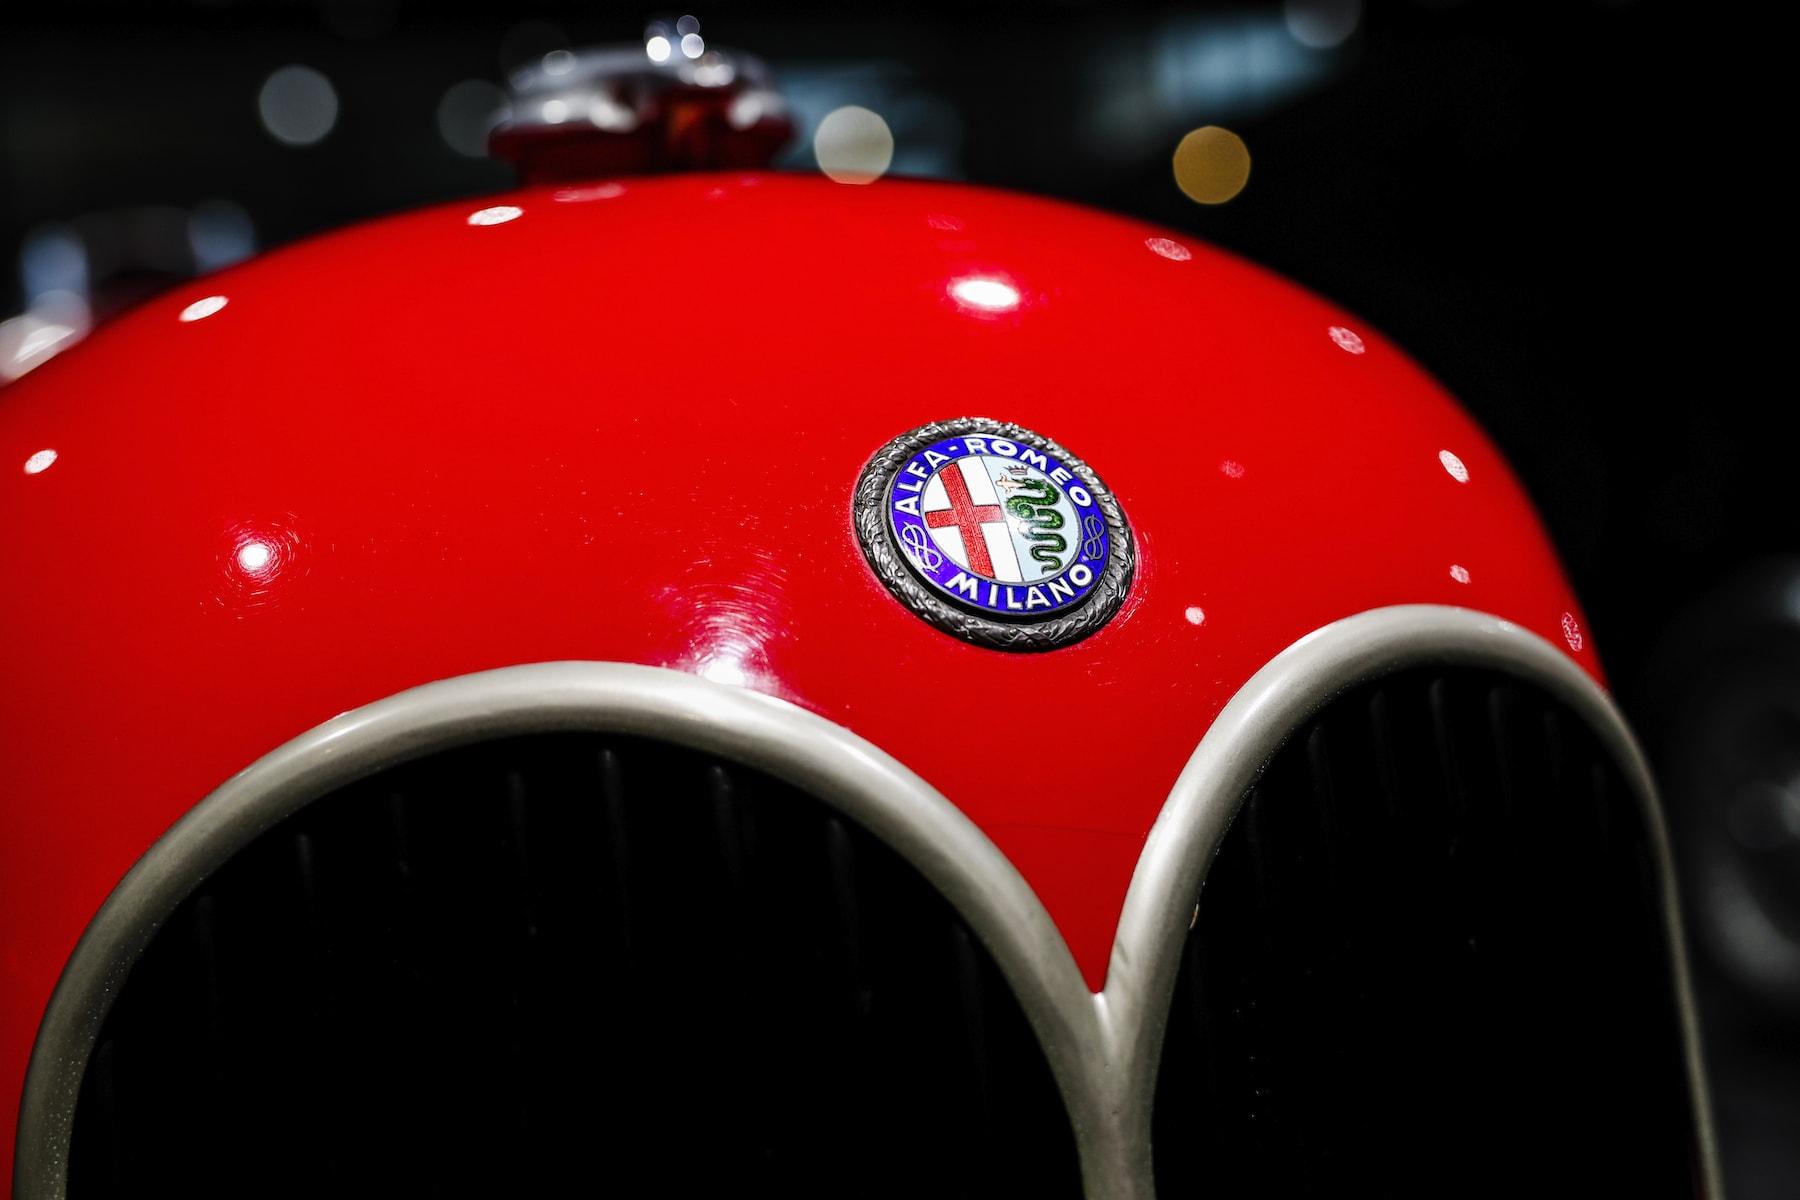 2019 Italian Grand Prix copy.jpg